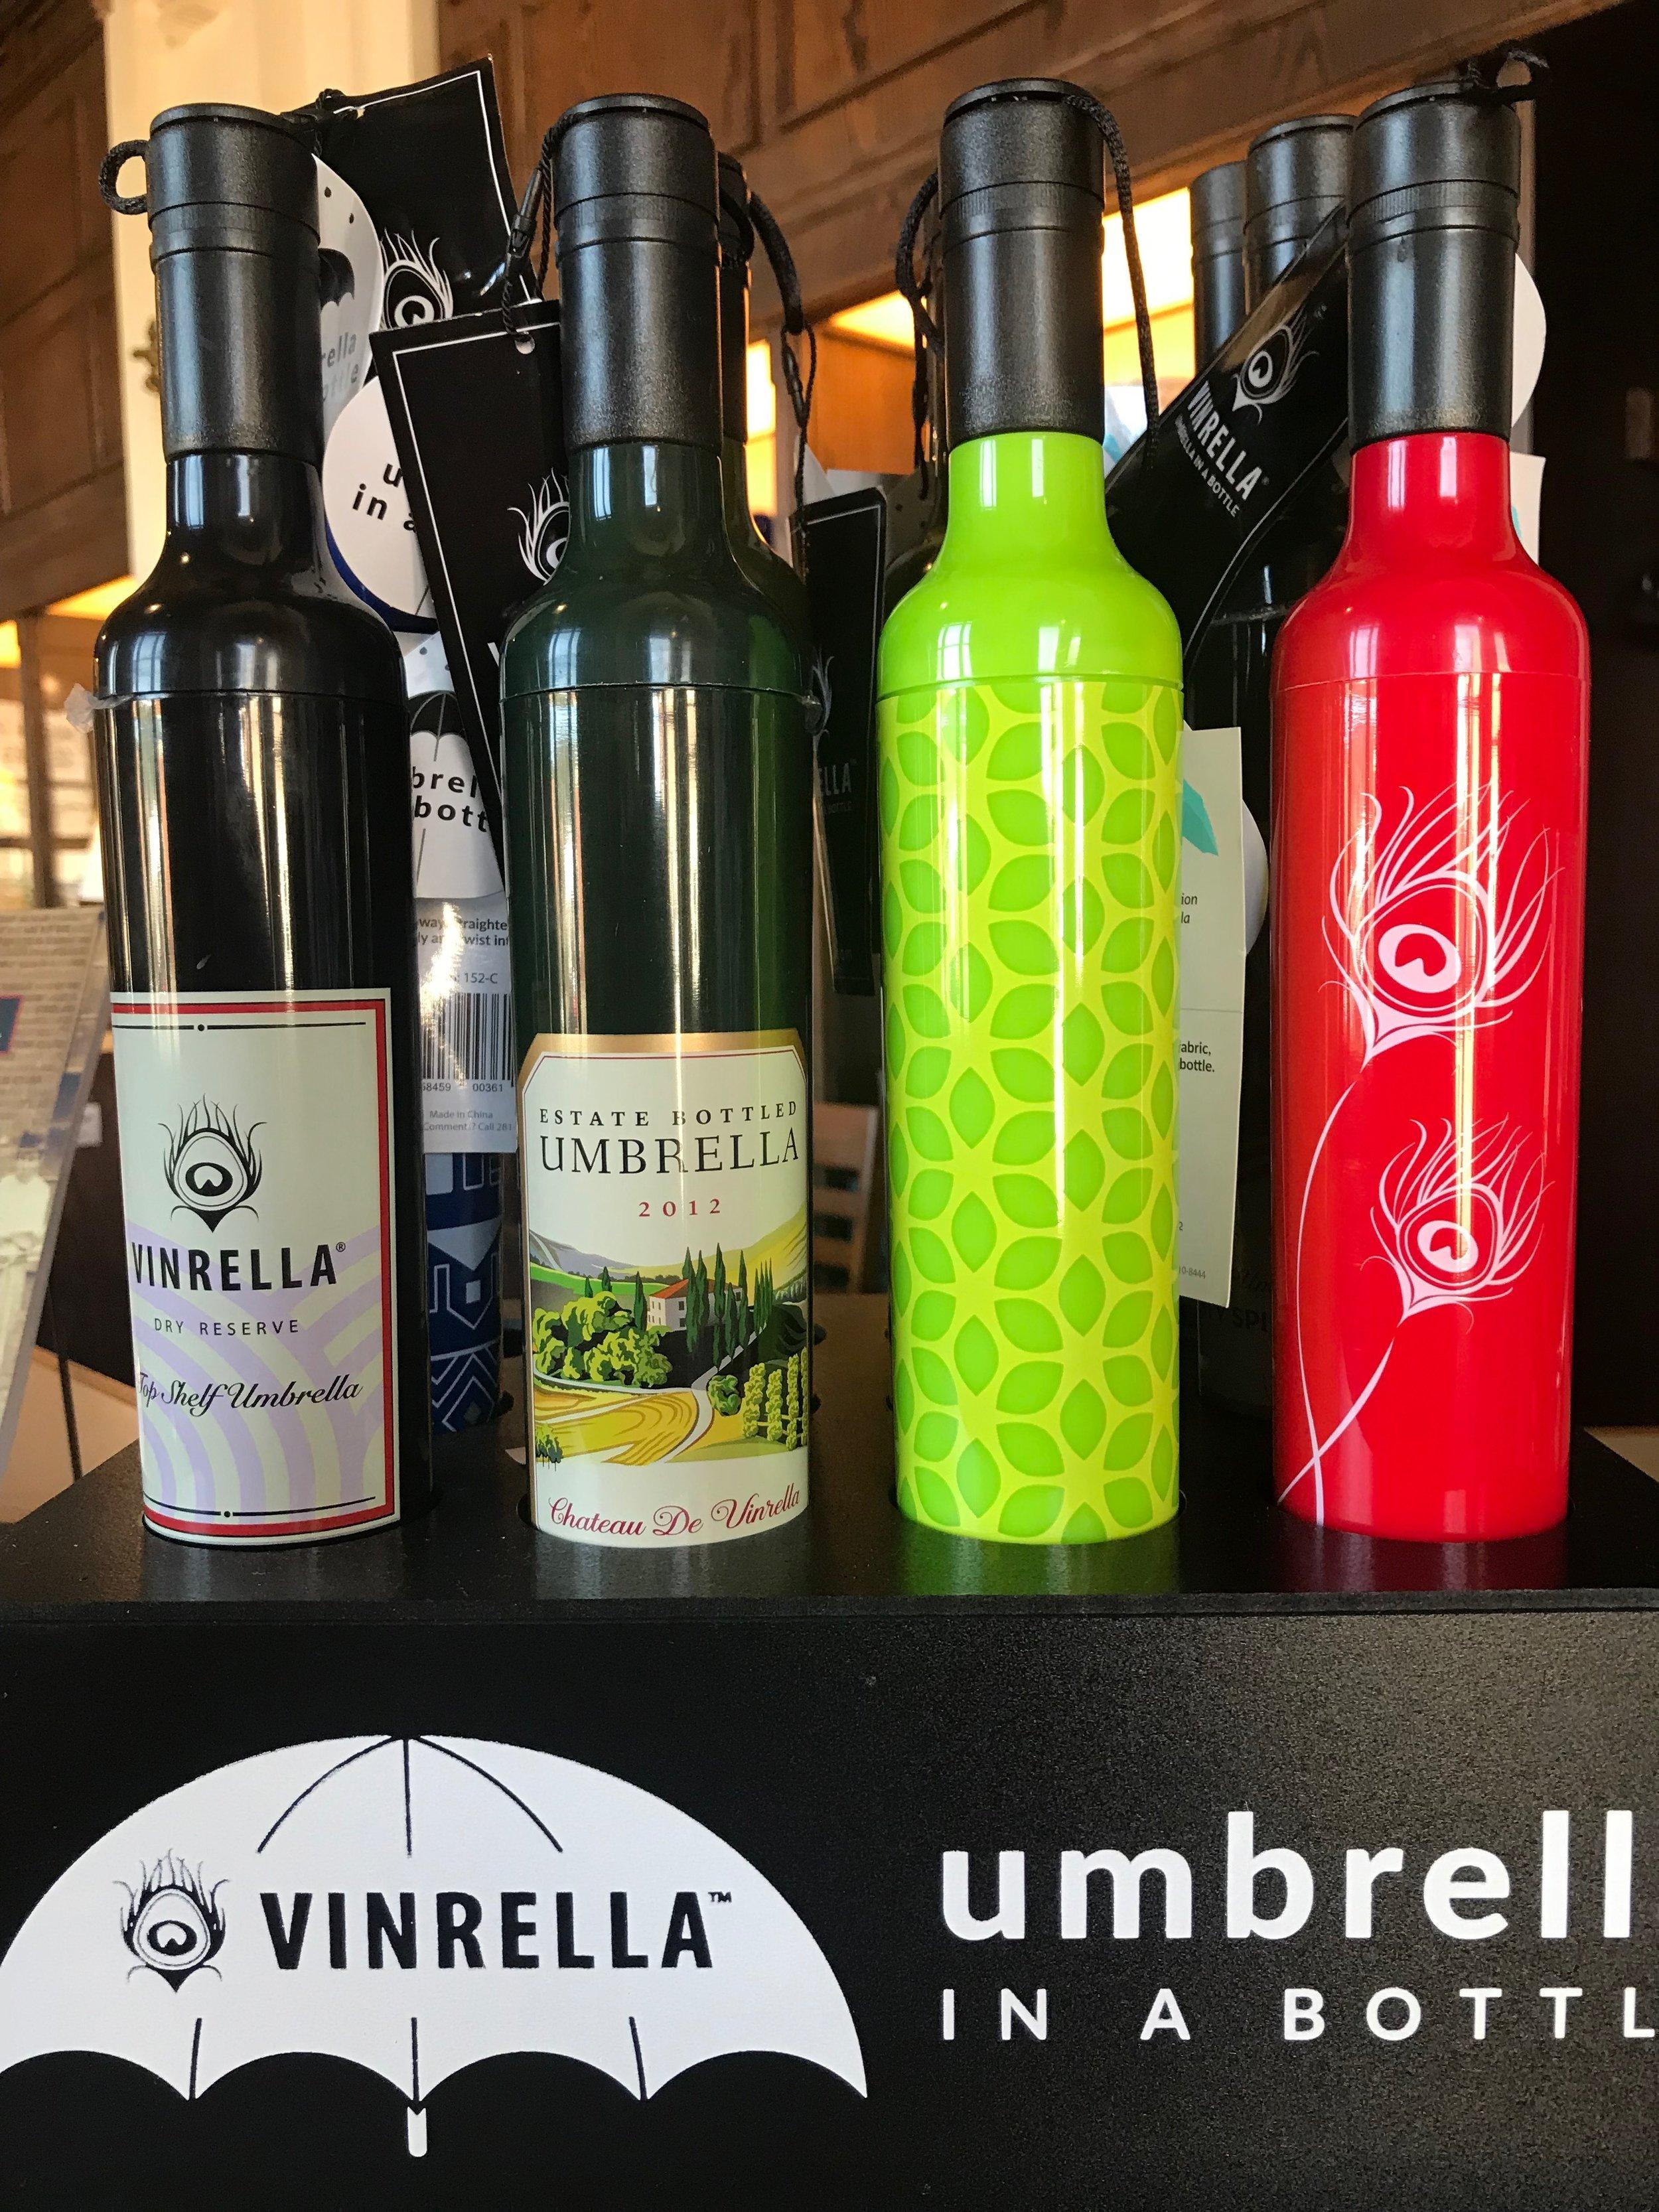 wine bottle umbrellas